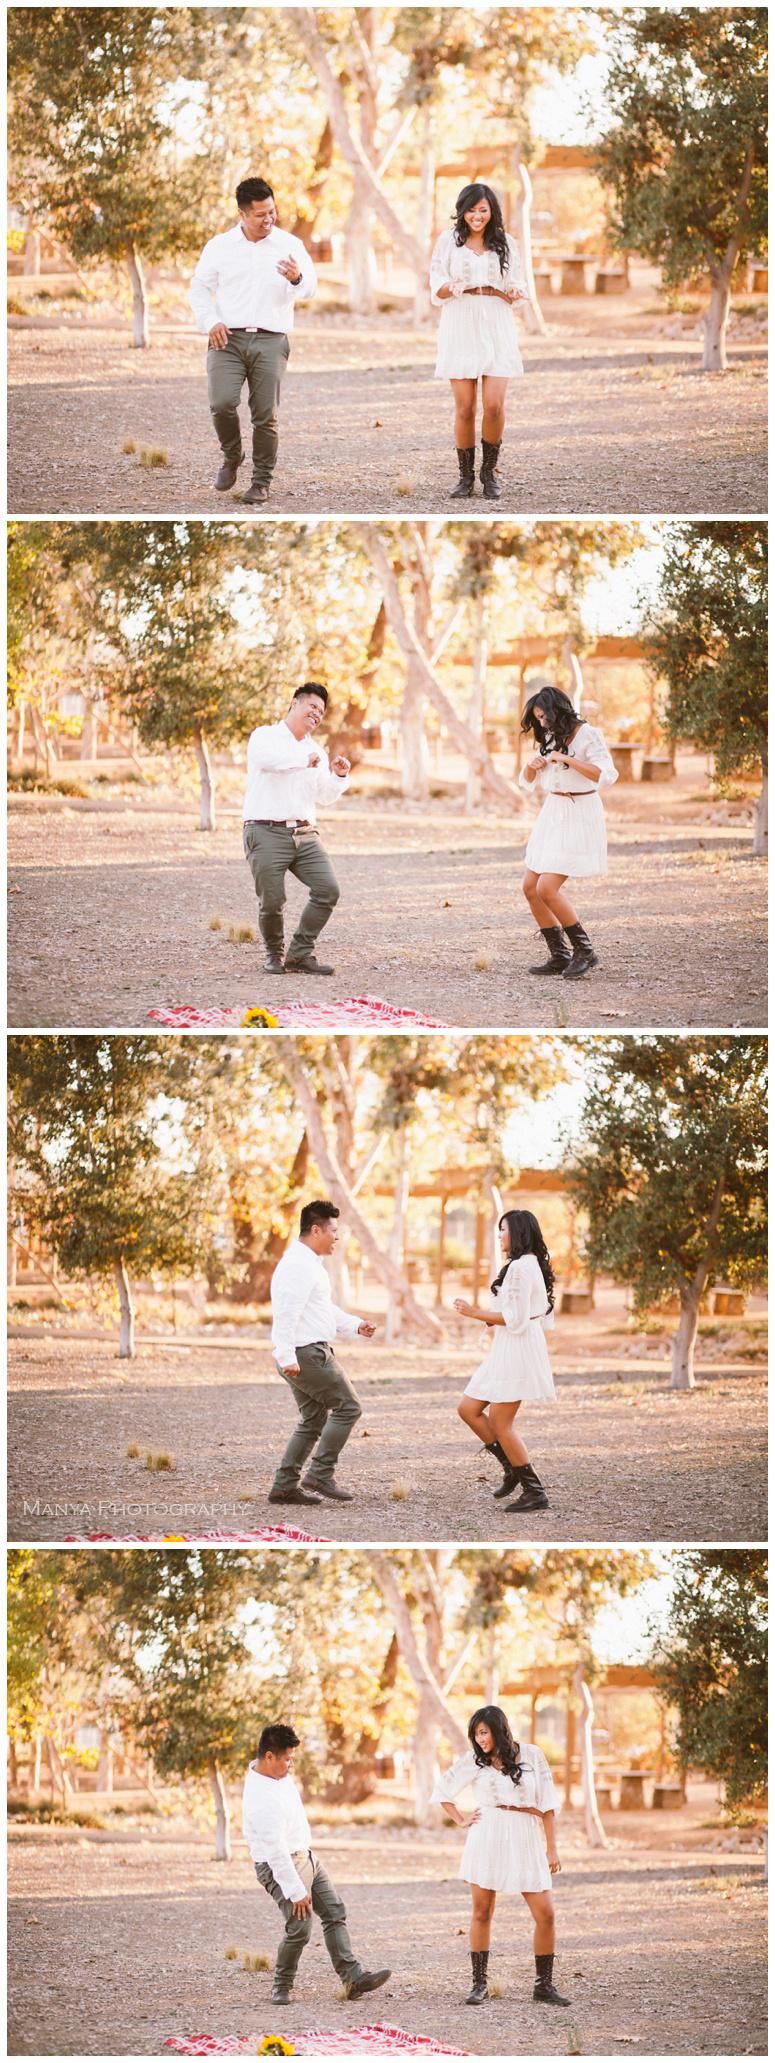 2015-02-01_0028- Tommy and Nancy | Engagement | San Juan Capistrano, CA | Southern California Wedding Photographer | Manya Photography